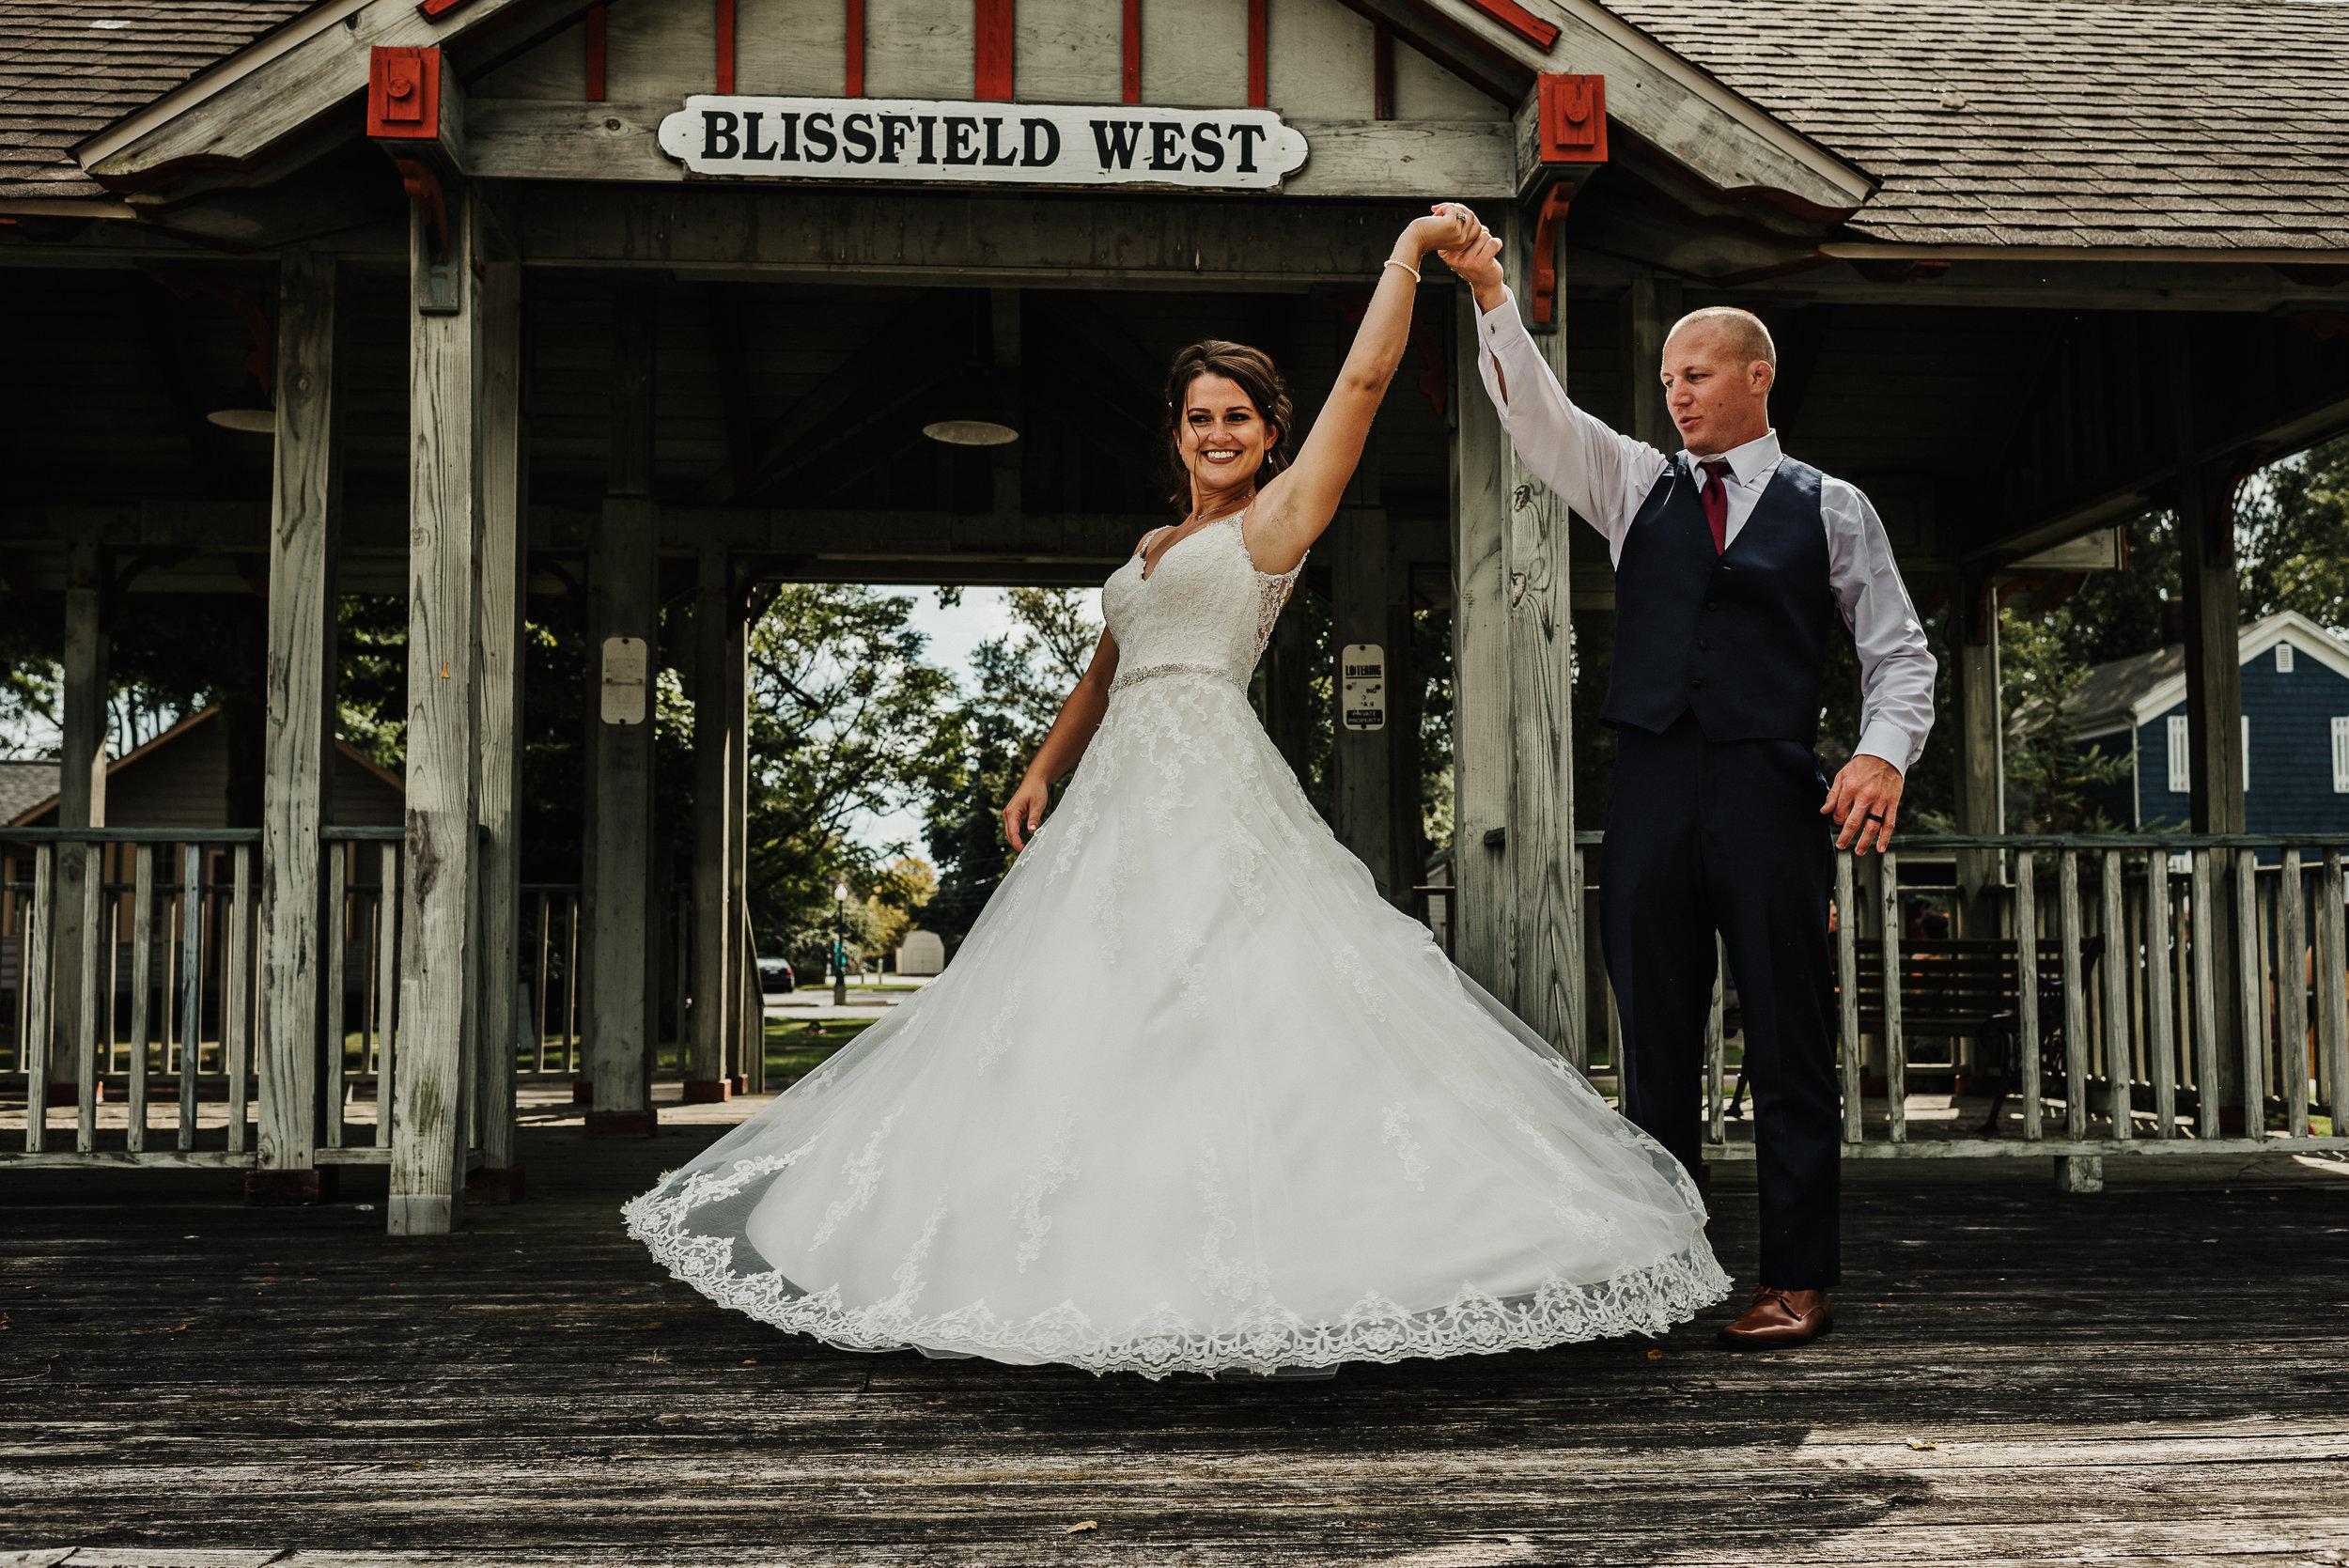 Small town summer wedding